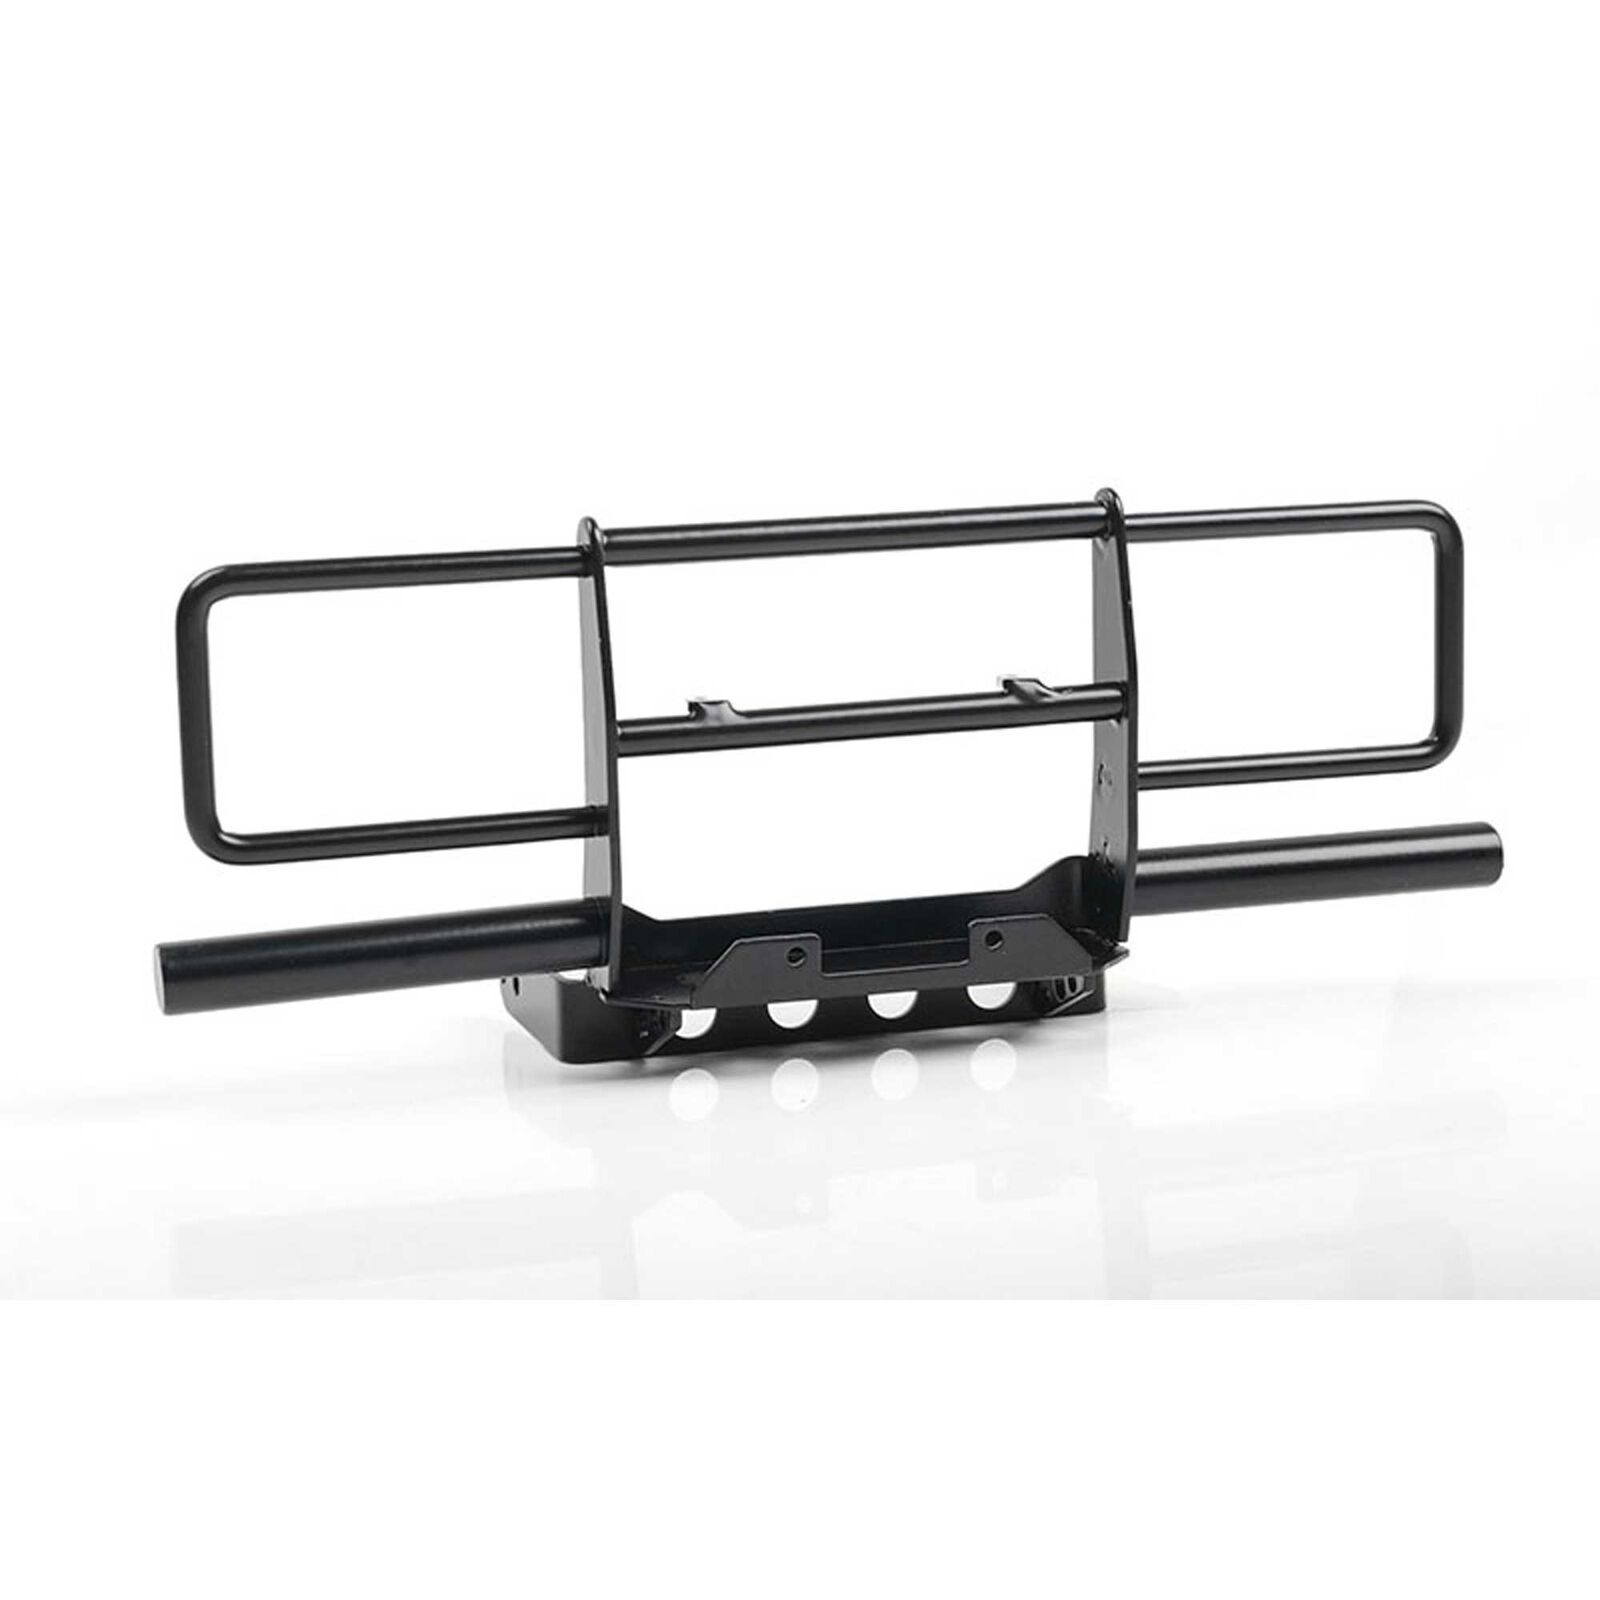 Oxer Steel Front Winch Bumper-VS4-10 Origin, Black